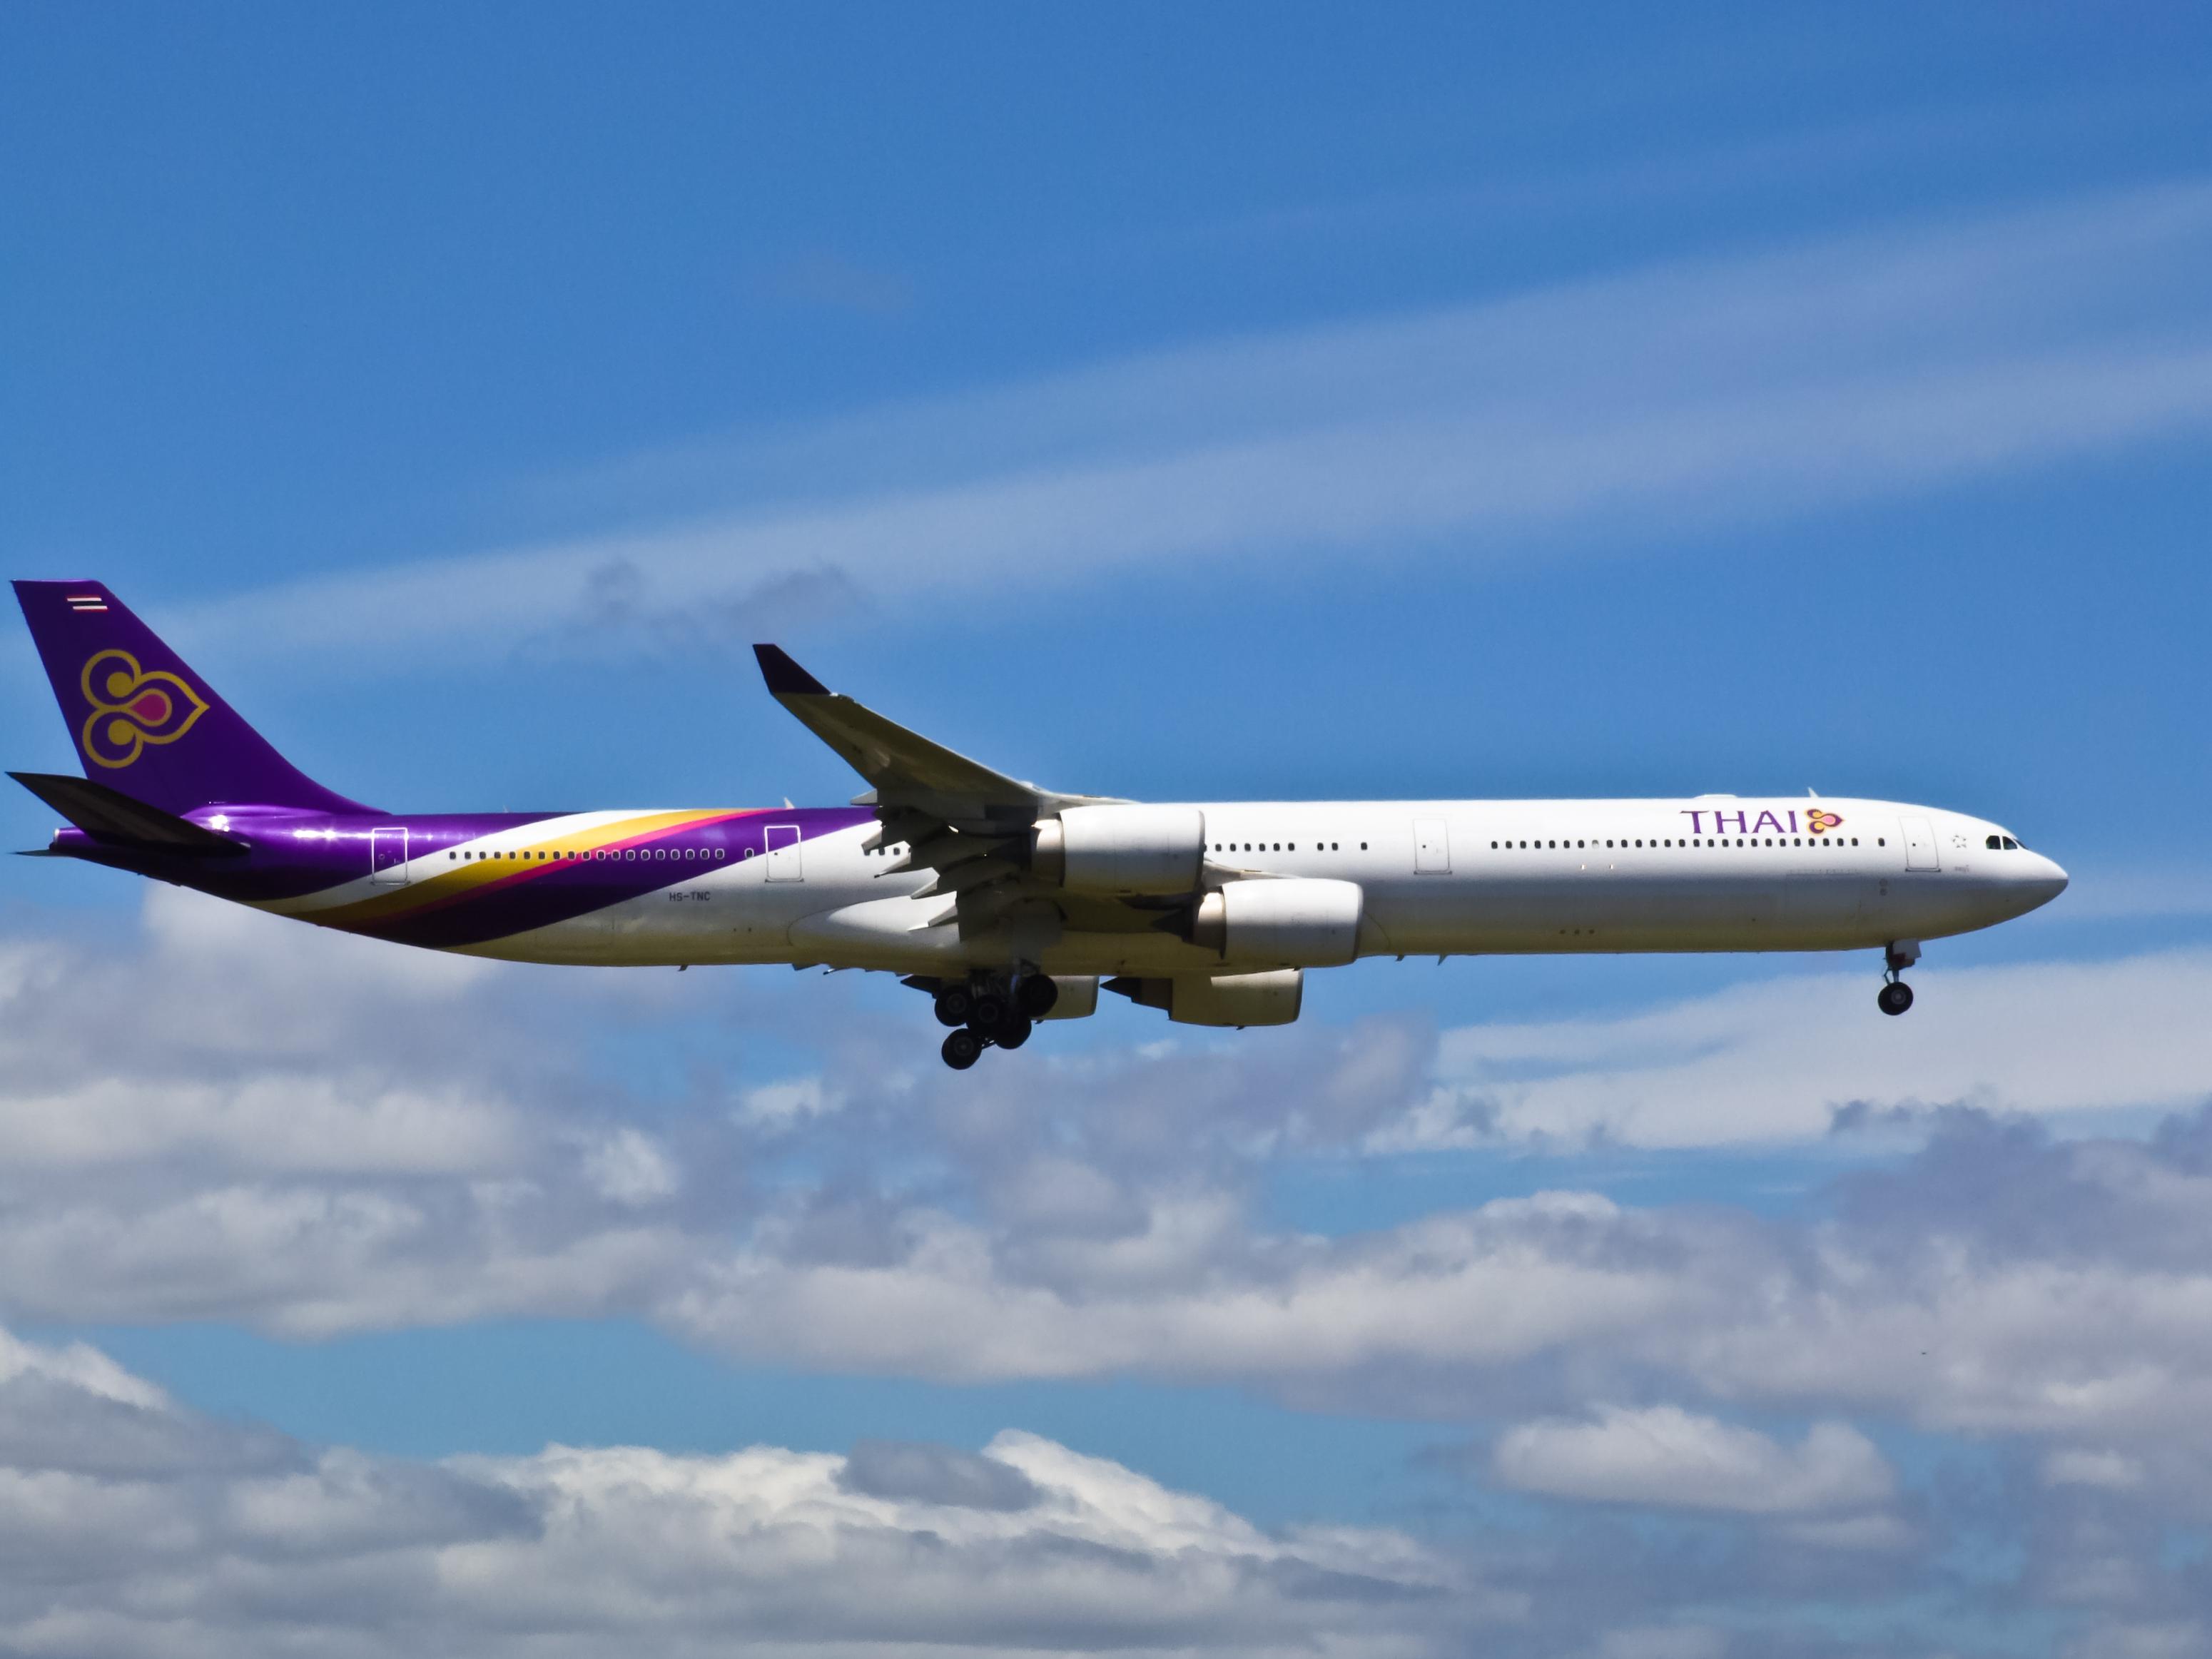 Thai airways five forces